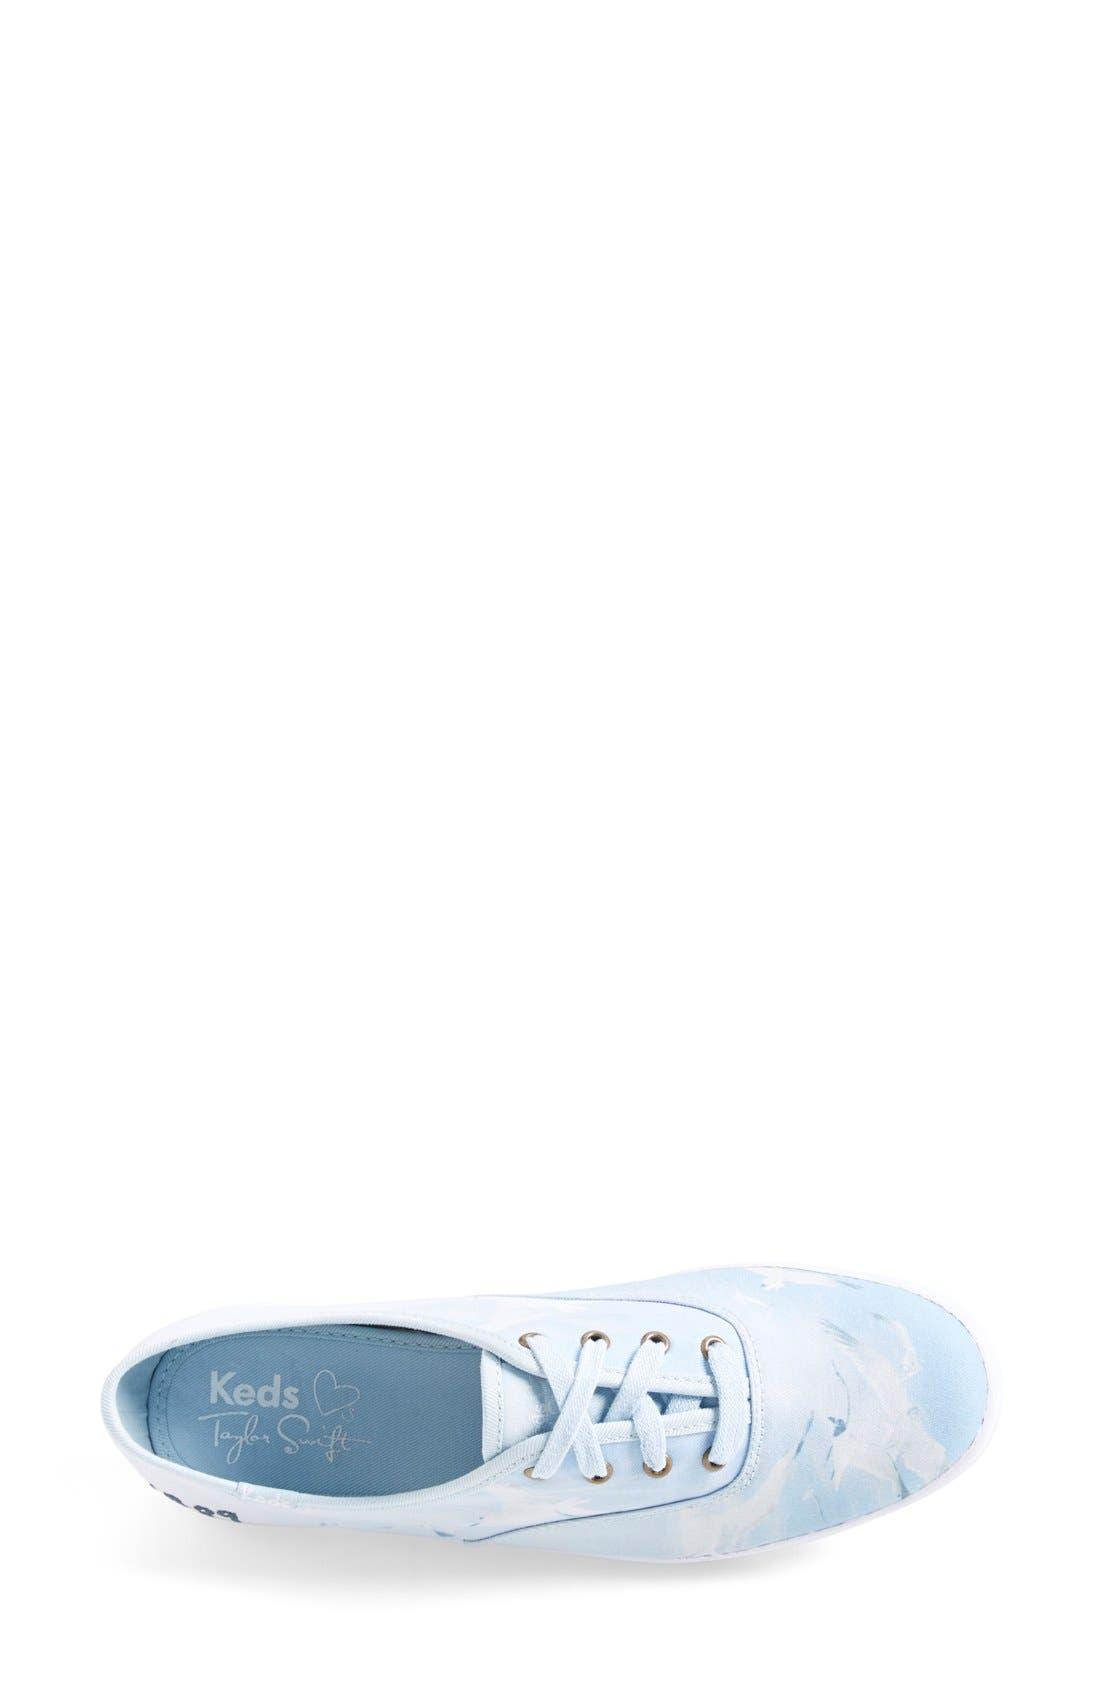 Alternate Image 3  - Keds® Taylor Swift 'Champion -1989' Sneaker (Women)